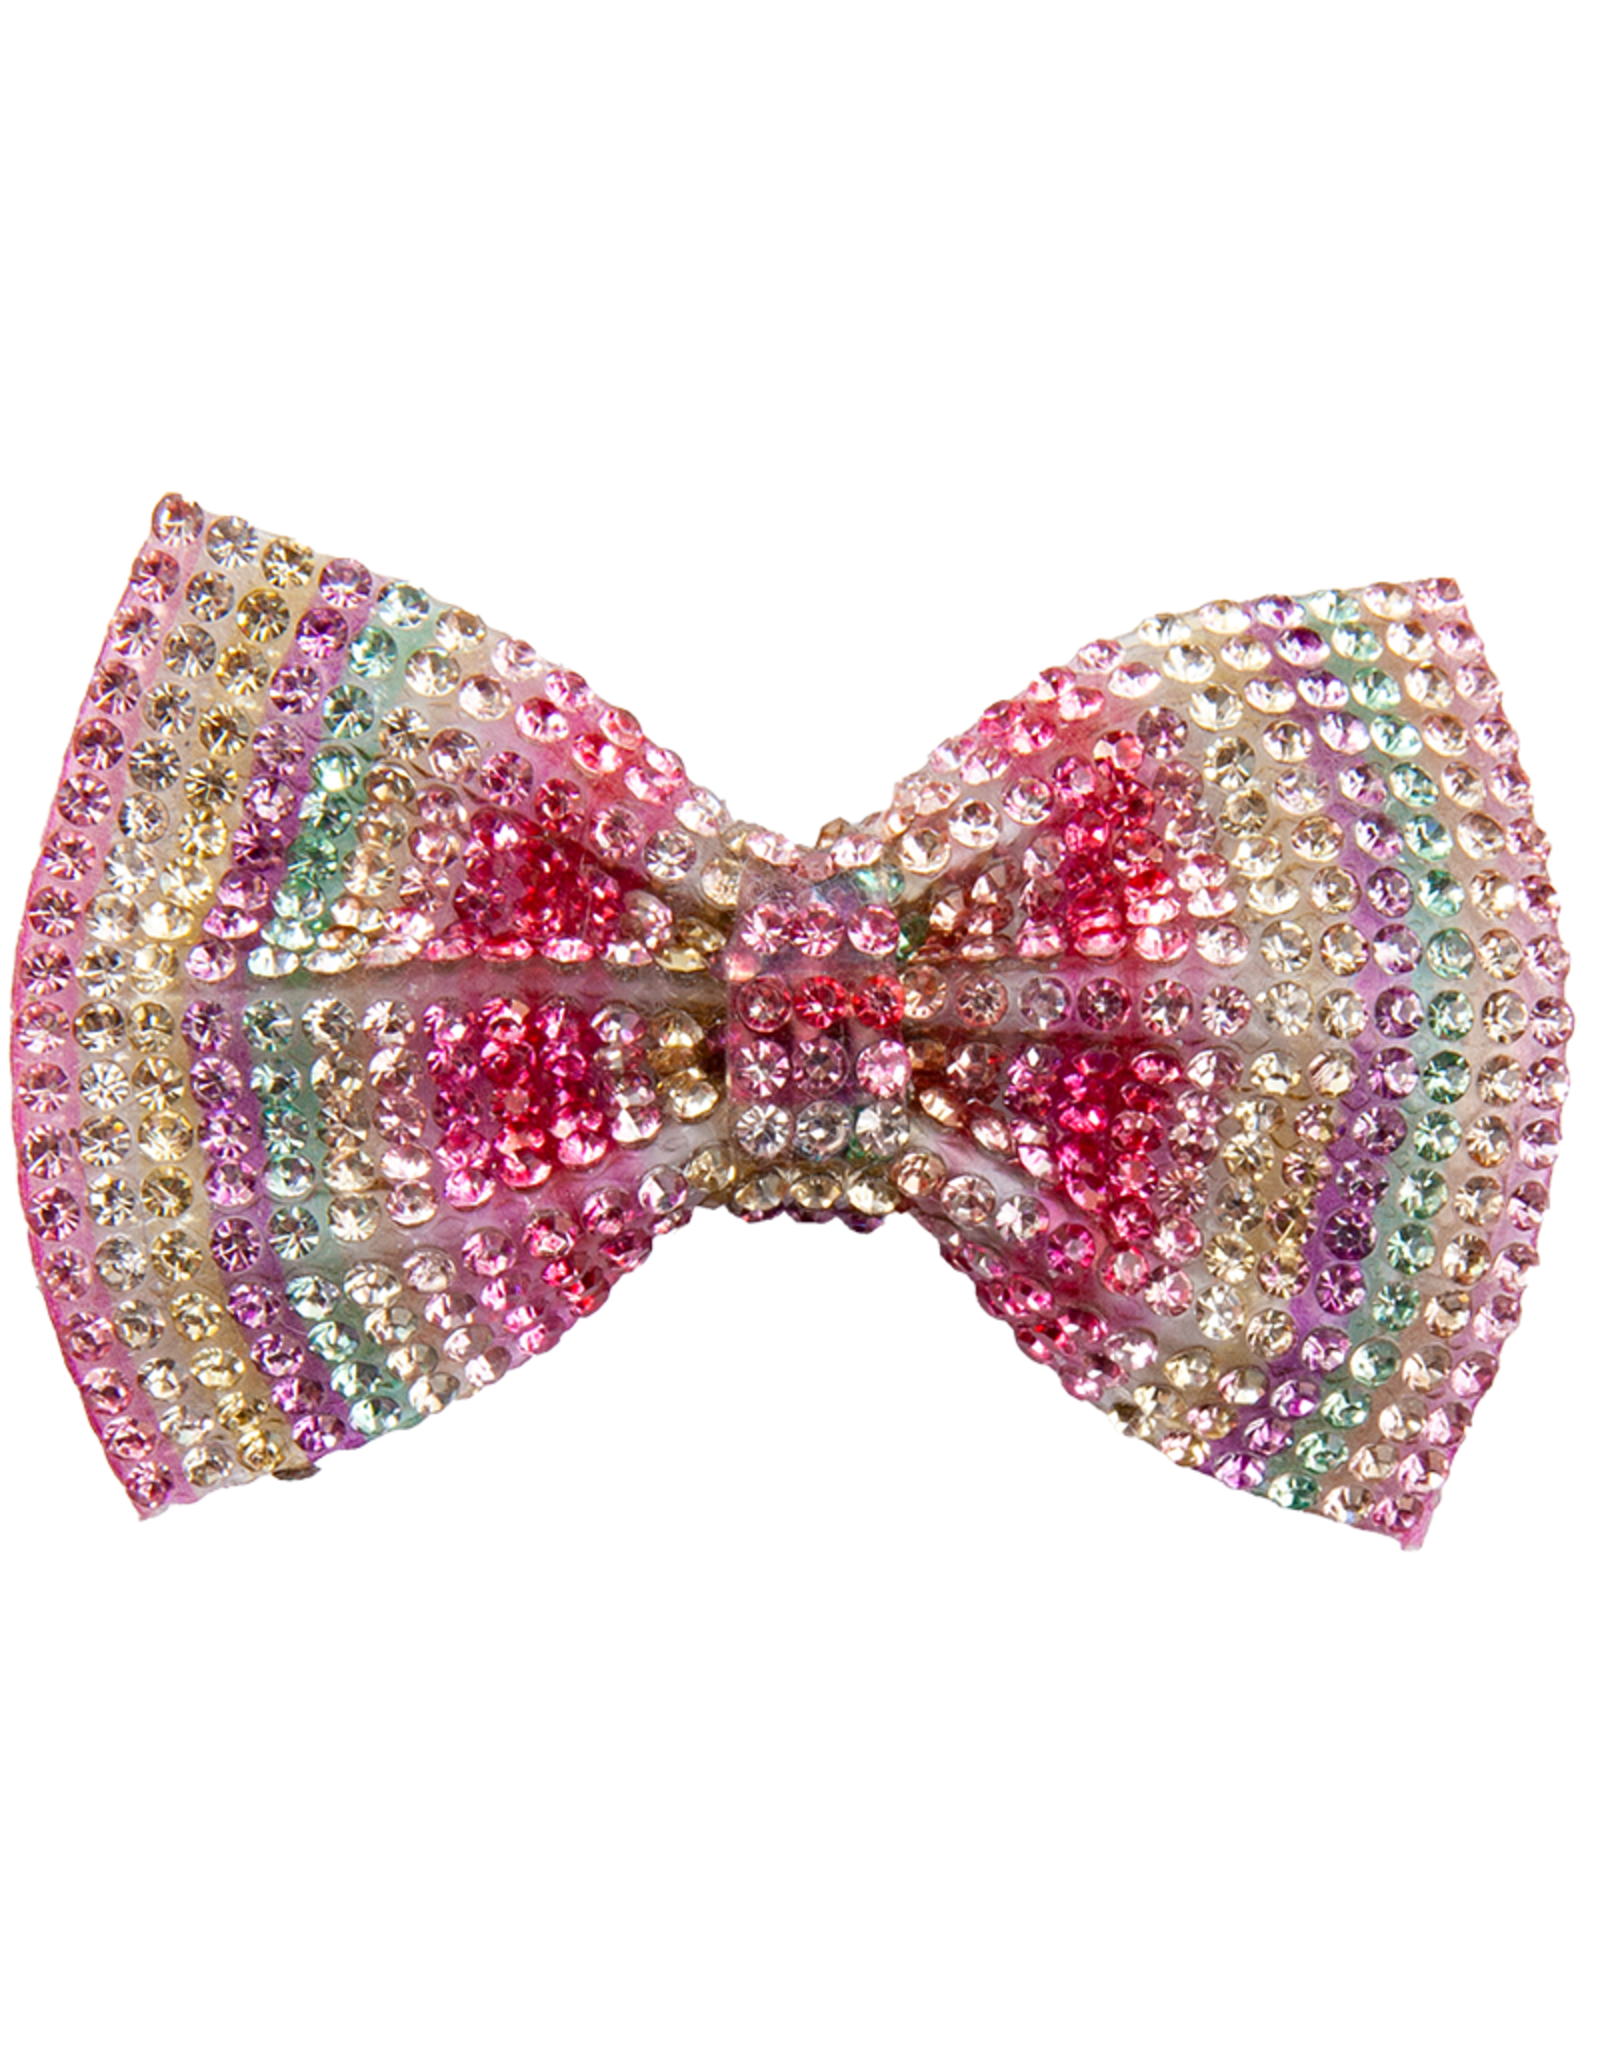 Great Pretenders Gem Bow Hair Clip, Pink Multi